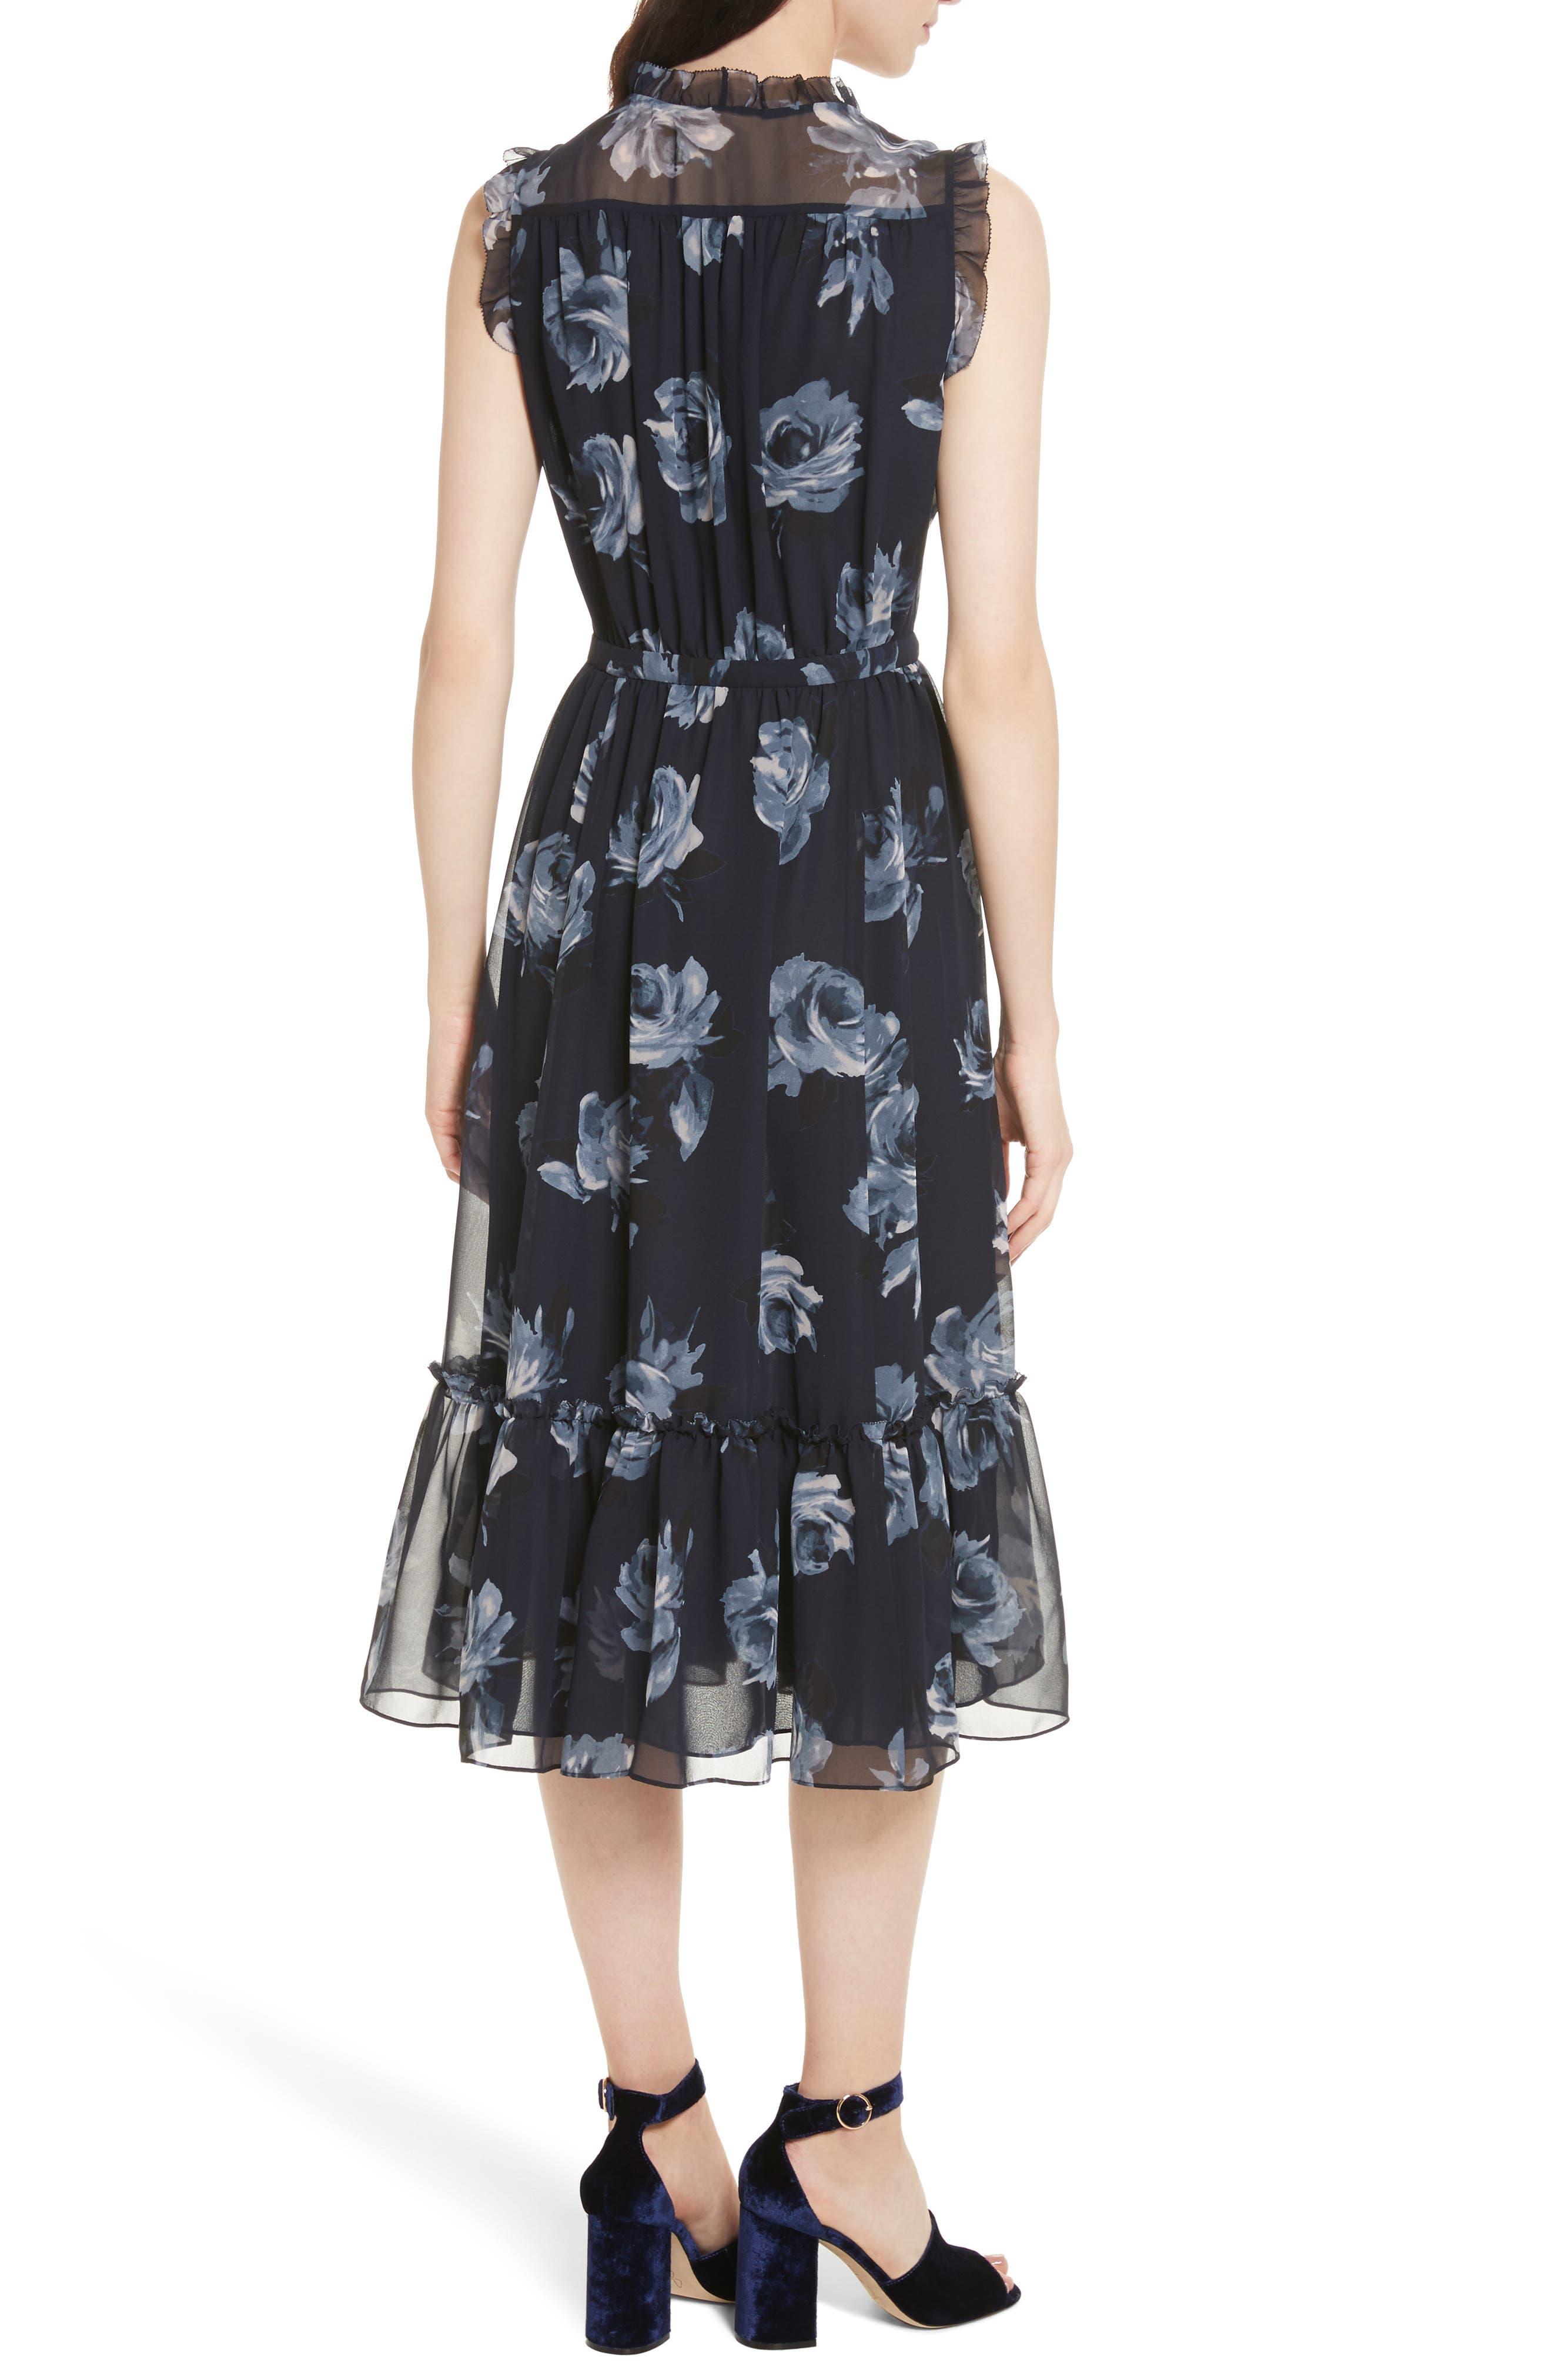 kade spade new york Night Rose Chiffon Midi Dress,                             Alternate thumbnail 2, color,                             473